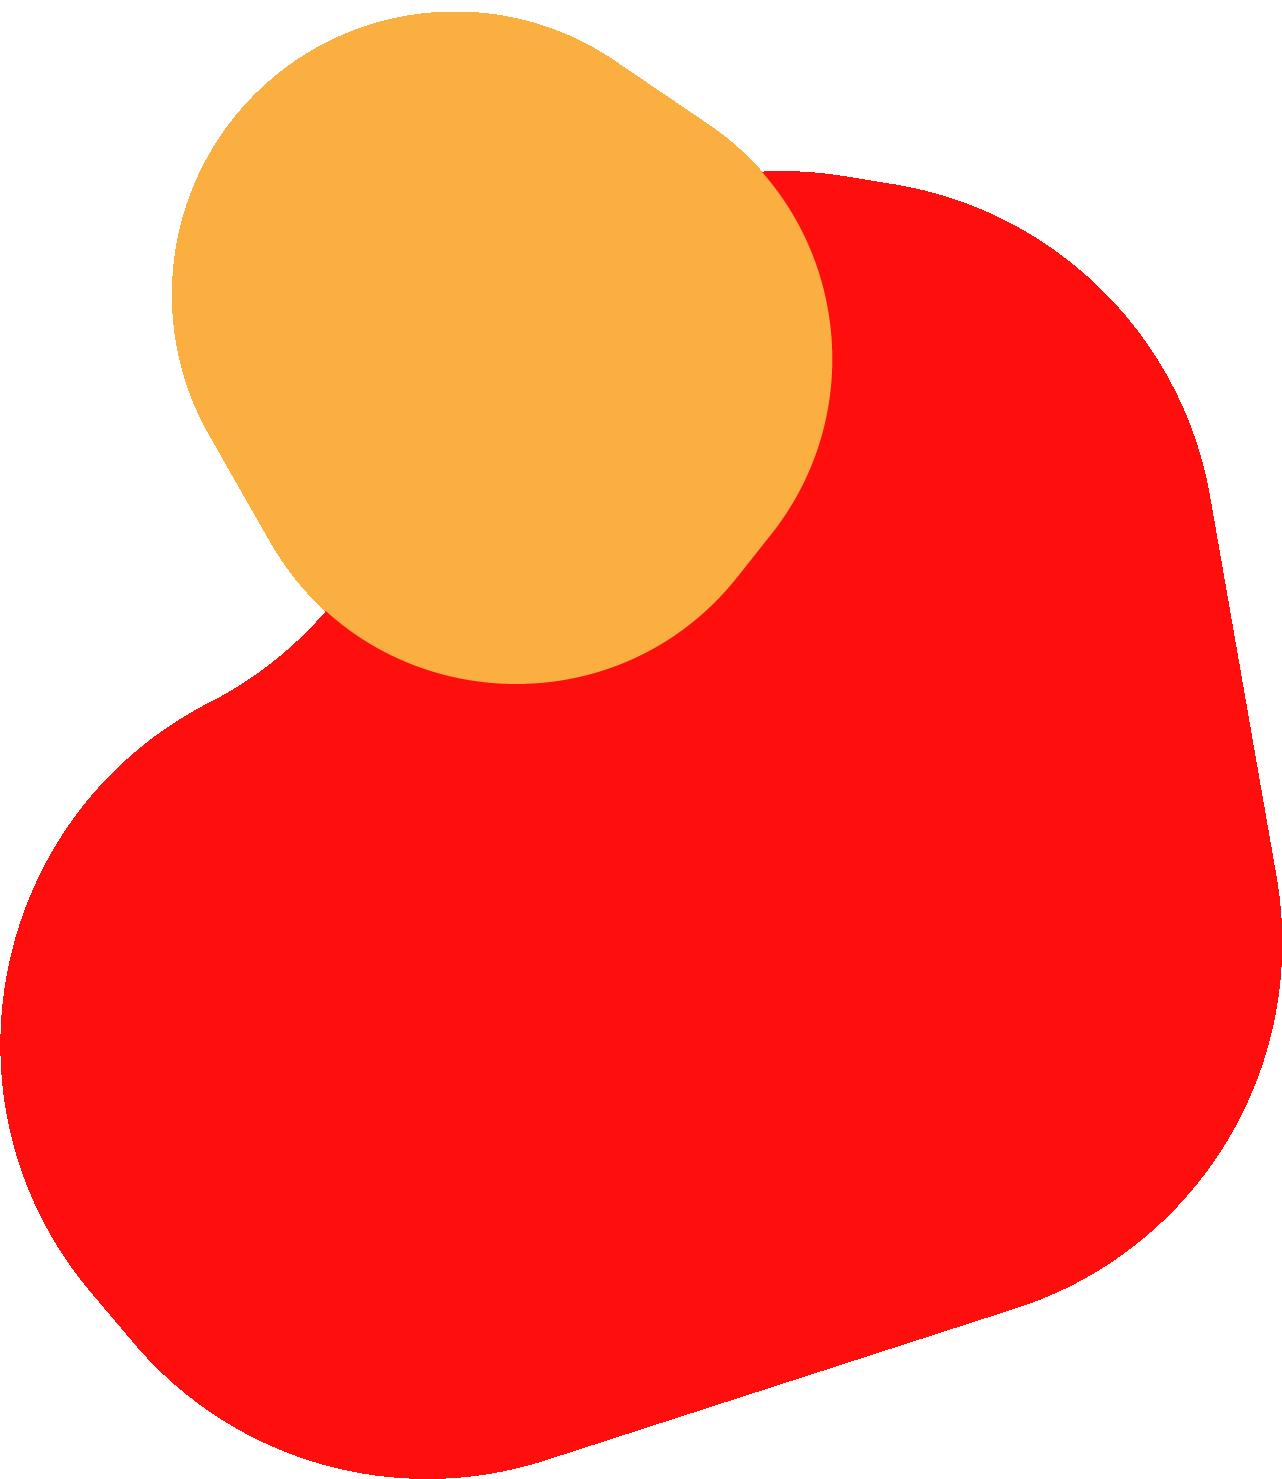 Blob illustration